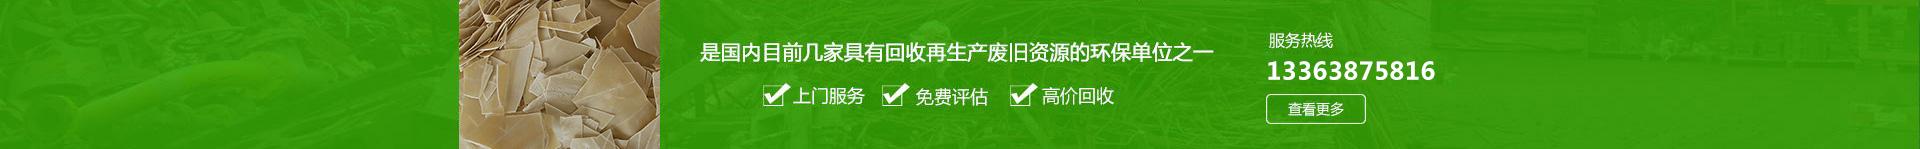 http://files.b2b.cn/skin/2017/0324/85e6391fd517011fb2d58e4395a263b1.jpg图片